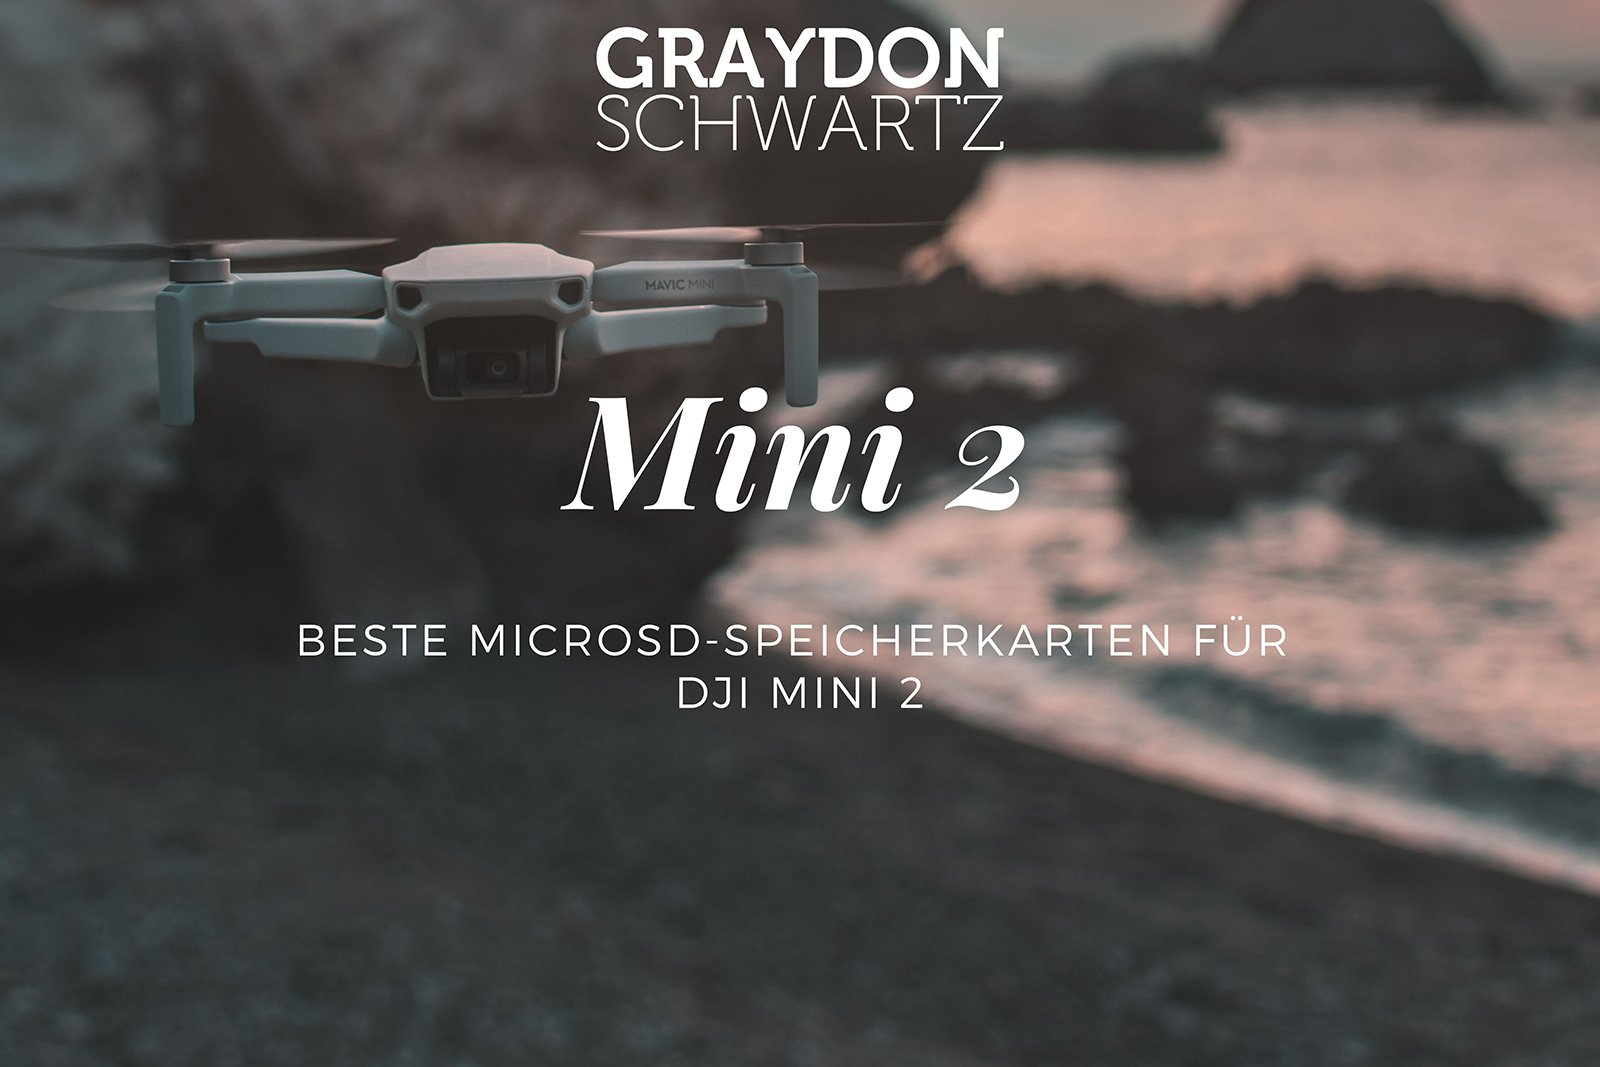 beste microsd speicherkarten fur dji mini 2 | graydonschwartz.com